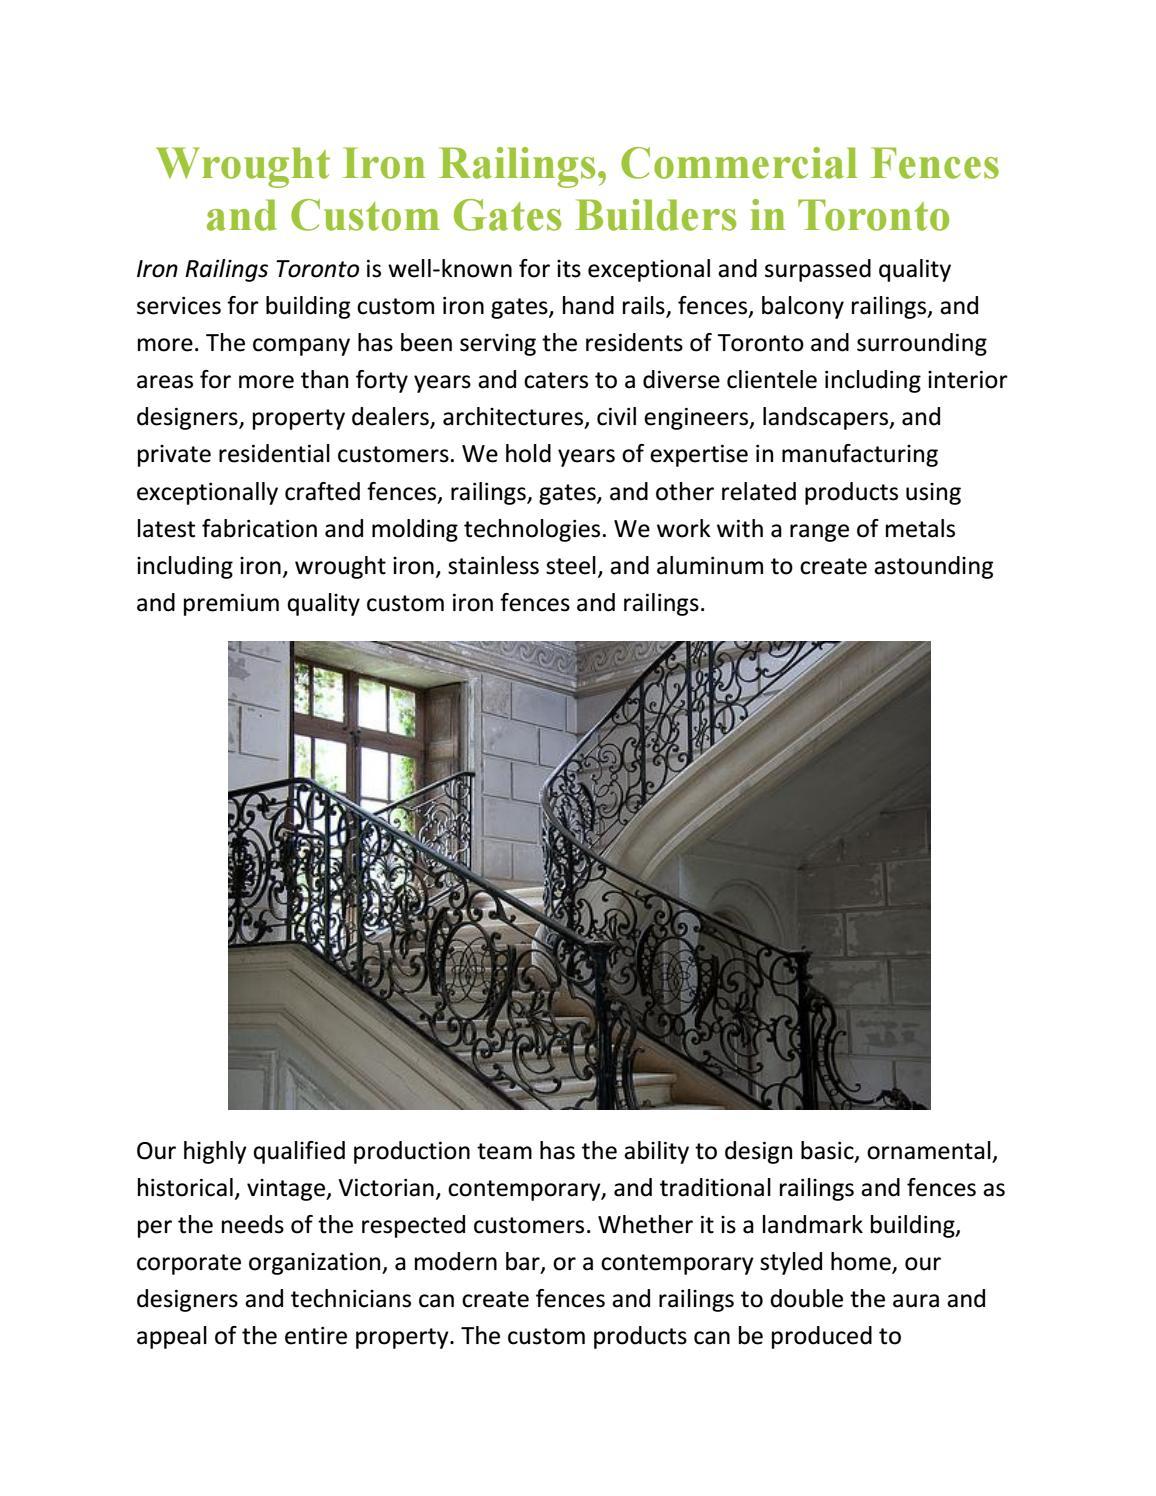 Iron Railing Design For Balcony In Toronto By Rishabh Singla Issuu,Female Jewellery Gold Ring New Design 2020